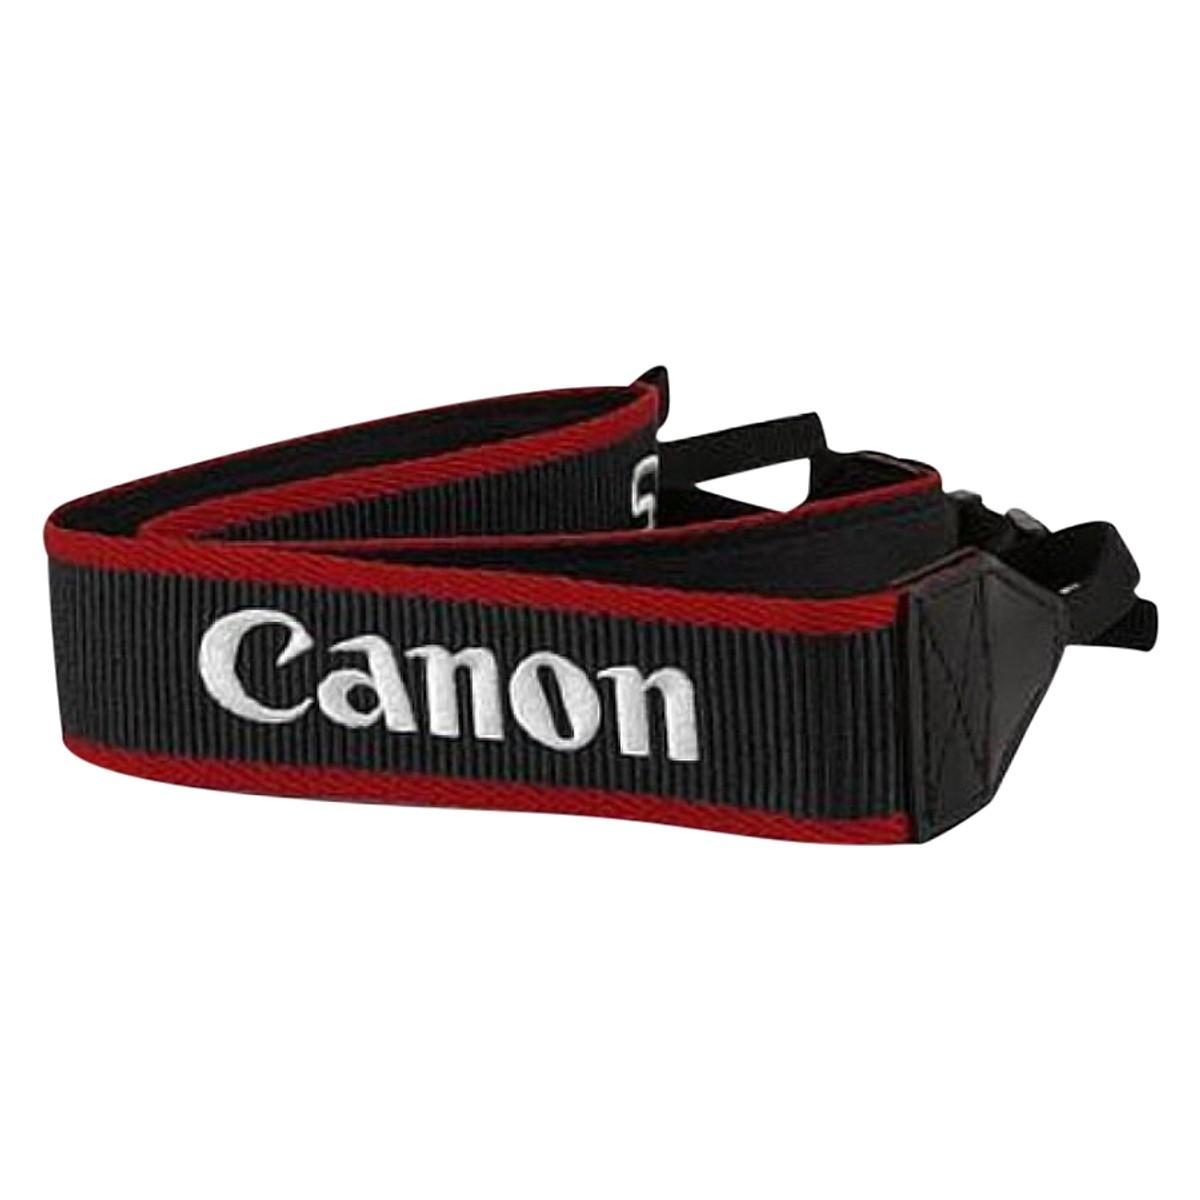 Canon   Máy ảnh kỹ thuật số   Dây Đeo Máy Ảnh Cho Canon EOS